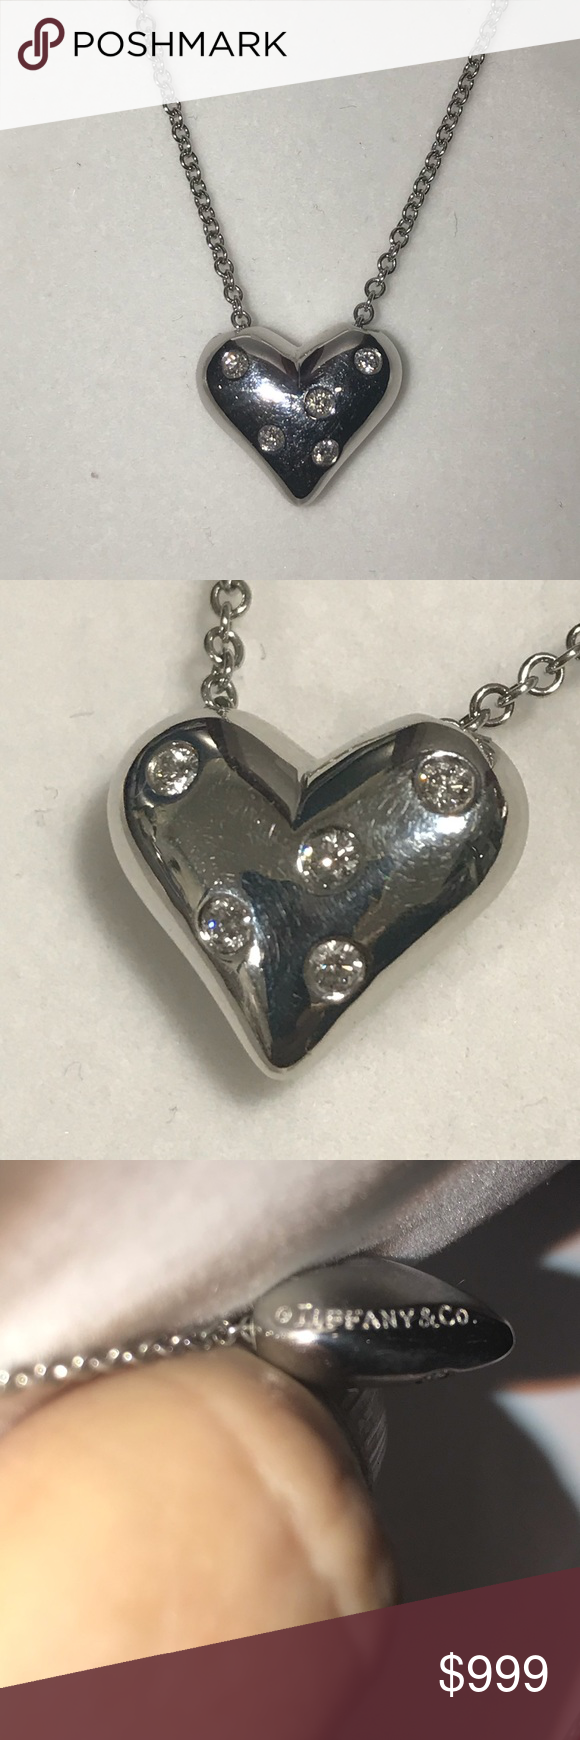 New Item Tiffany 17 Platinum Etoile Necklace Beautiful Tiffany Co 17 5 Diamond Platinum Ettoile Puff Womens Jewelry Necklace Necklace Heart Charm Bracelet